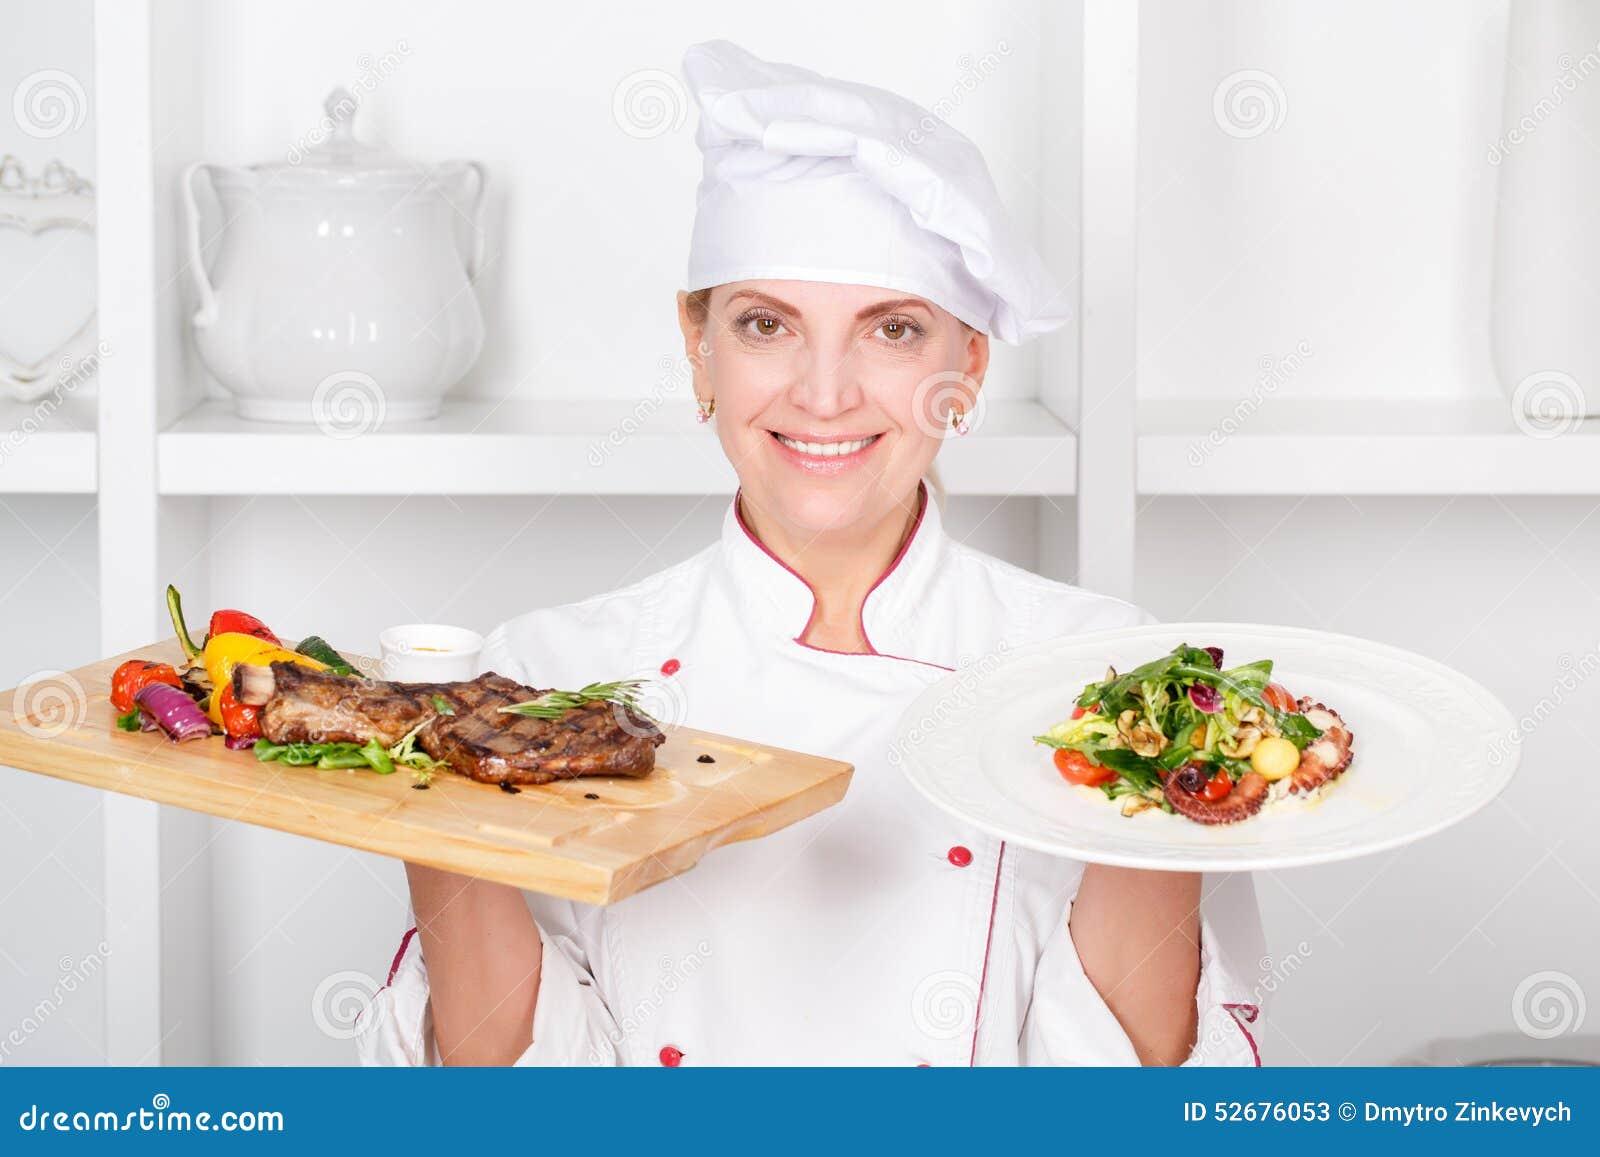 Chef Cuisinier Pr Sent Des Repas Photo Stock Image 52676053